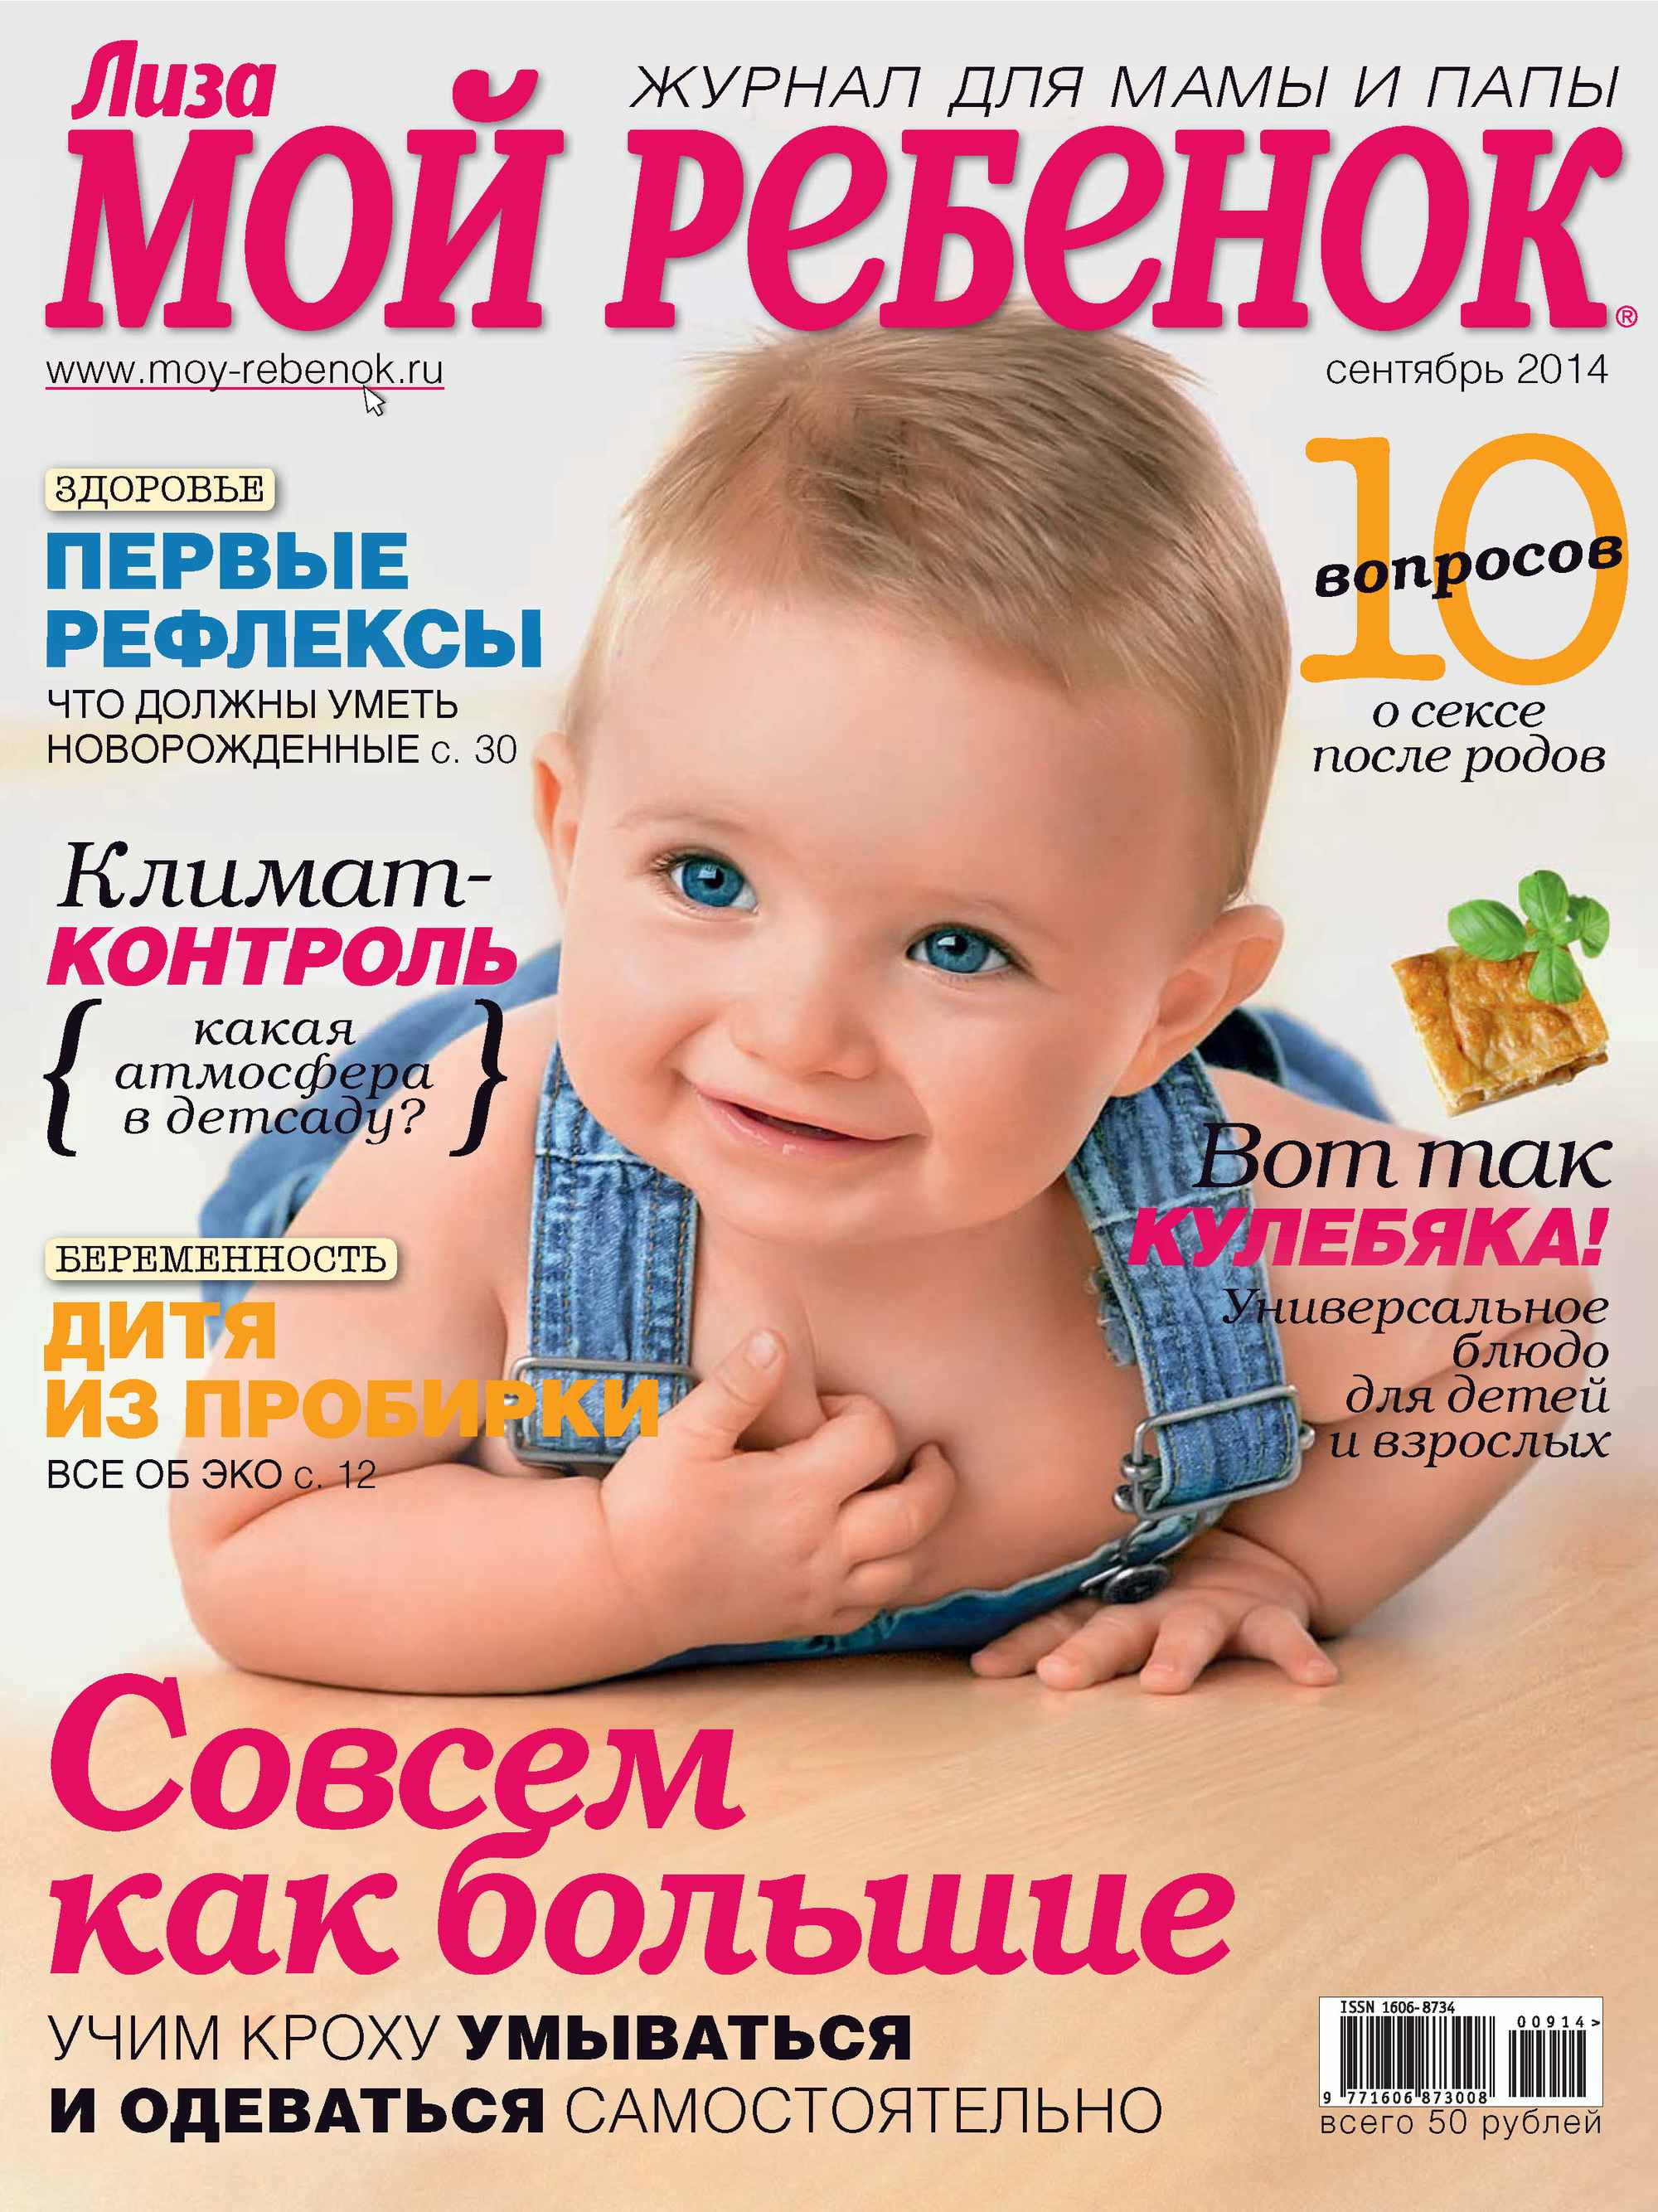 ИД «Бурда» Журнал «Лиза. Мой ребенок» №09/2014 ид бурда журнал лиза мой ребенок 11 2014